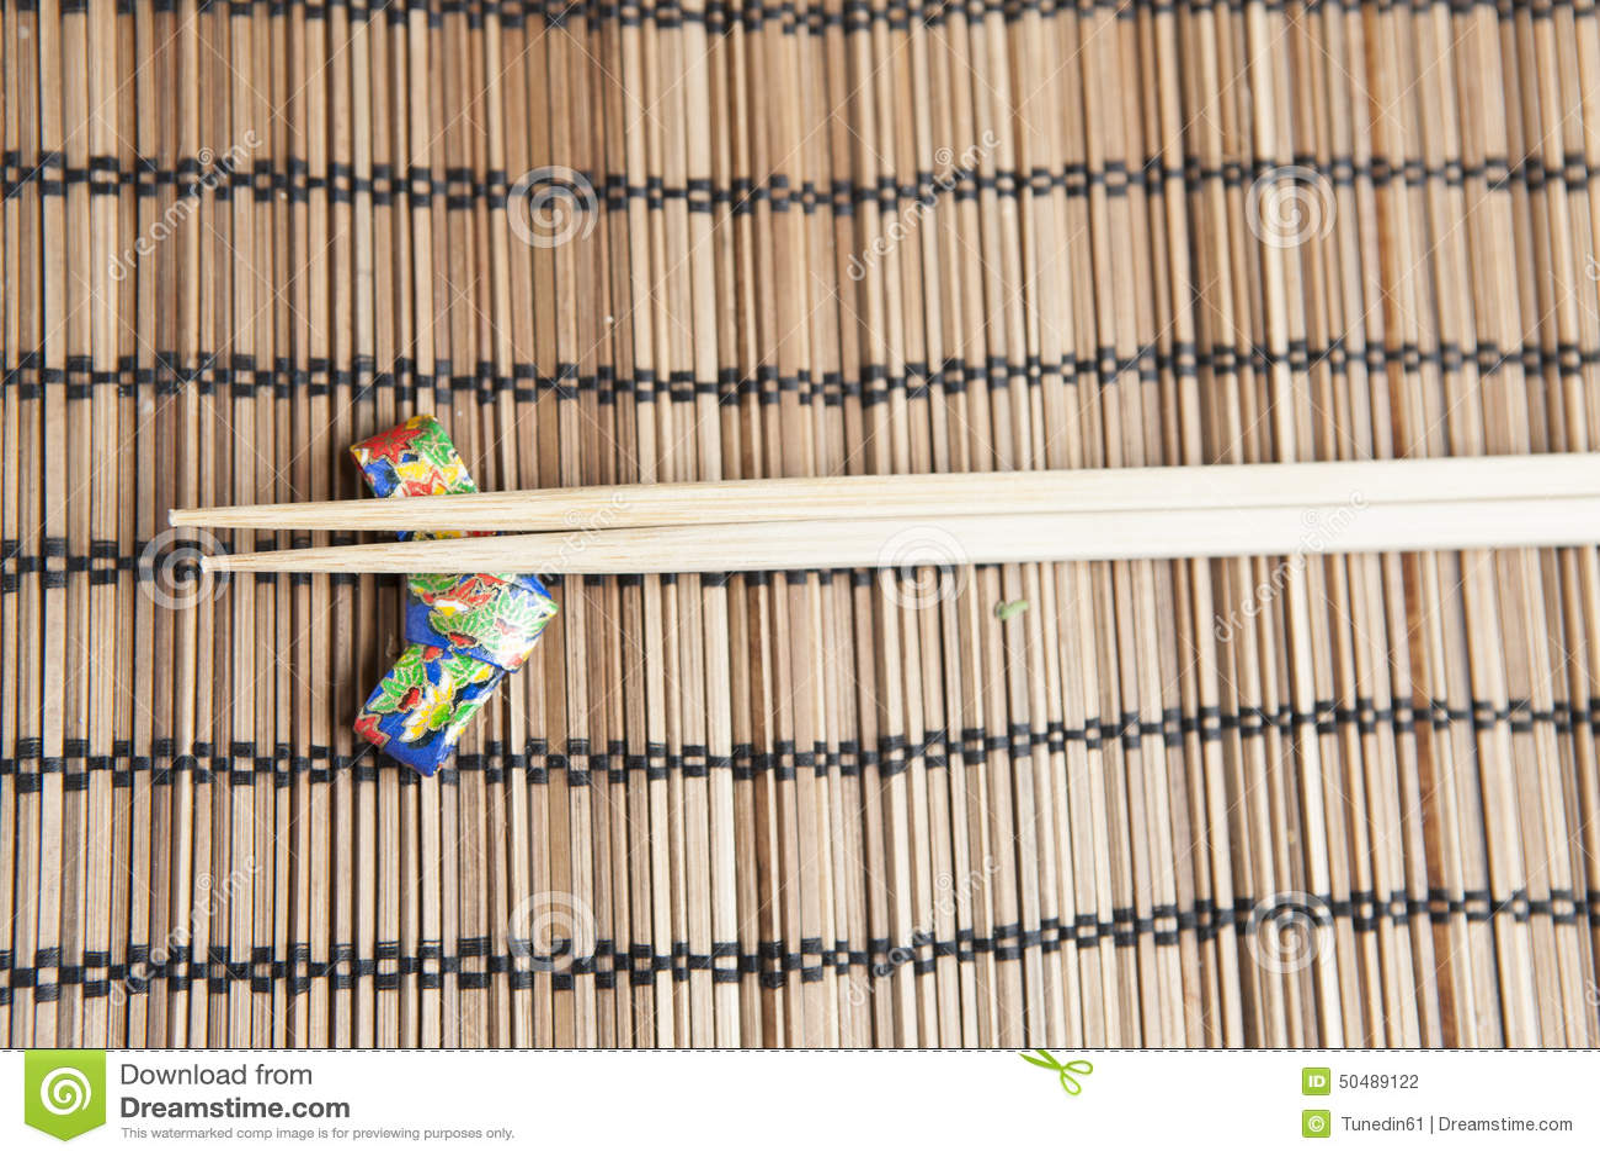 Bamboo Chopsticks On A Handmade Origami Chopstick Holder Stock Photo